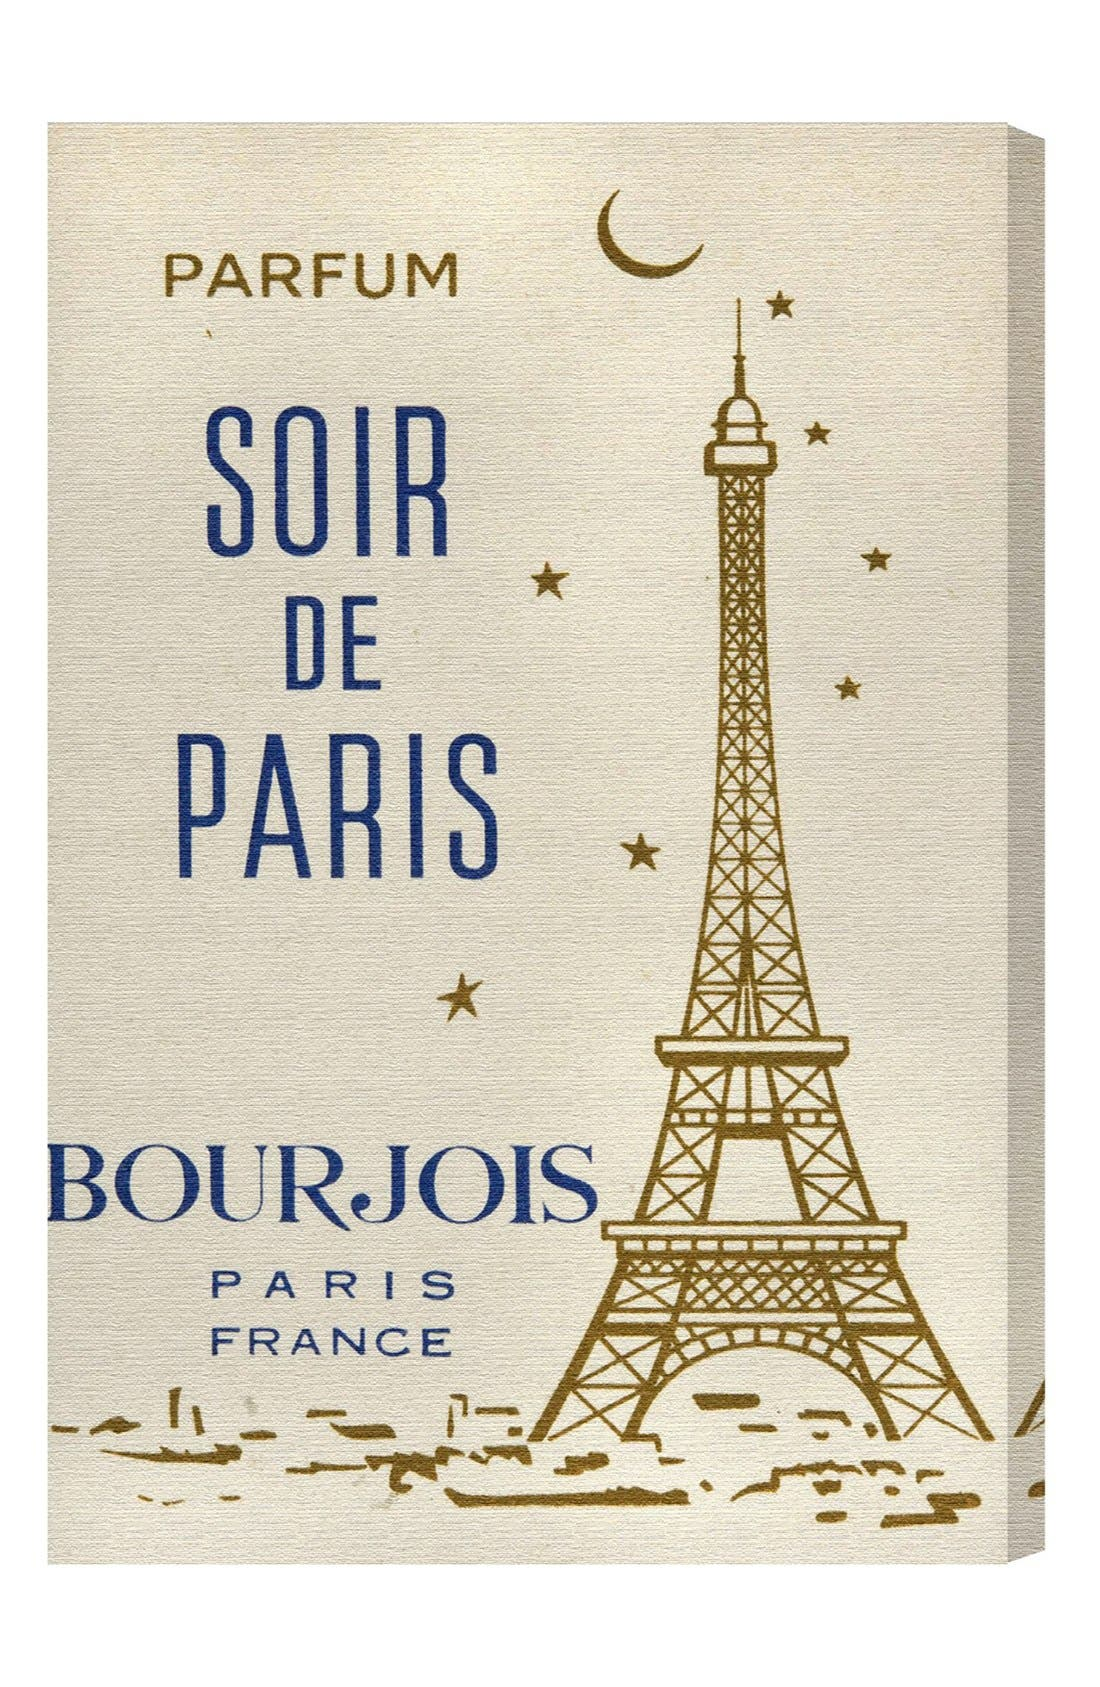 Oliver Gal 'Parfum Soir de Paris' Wall Art